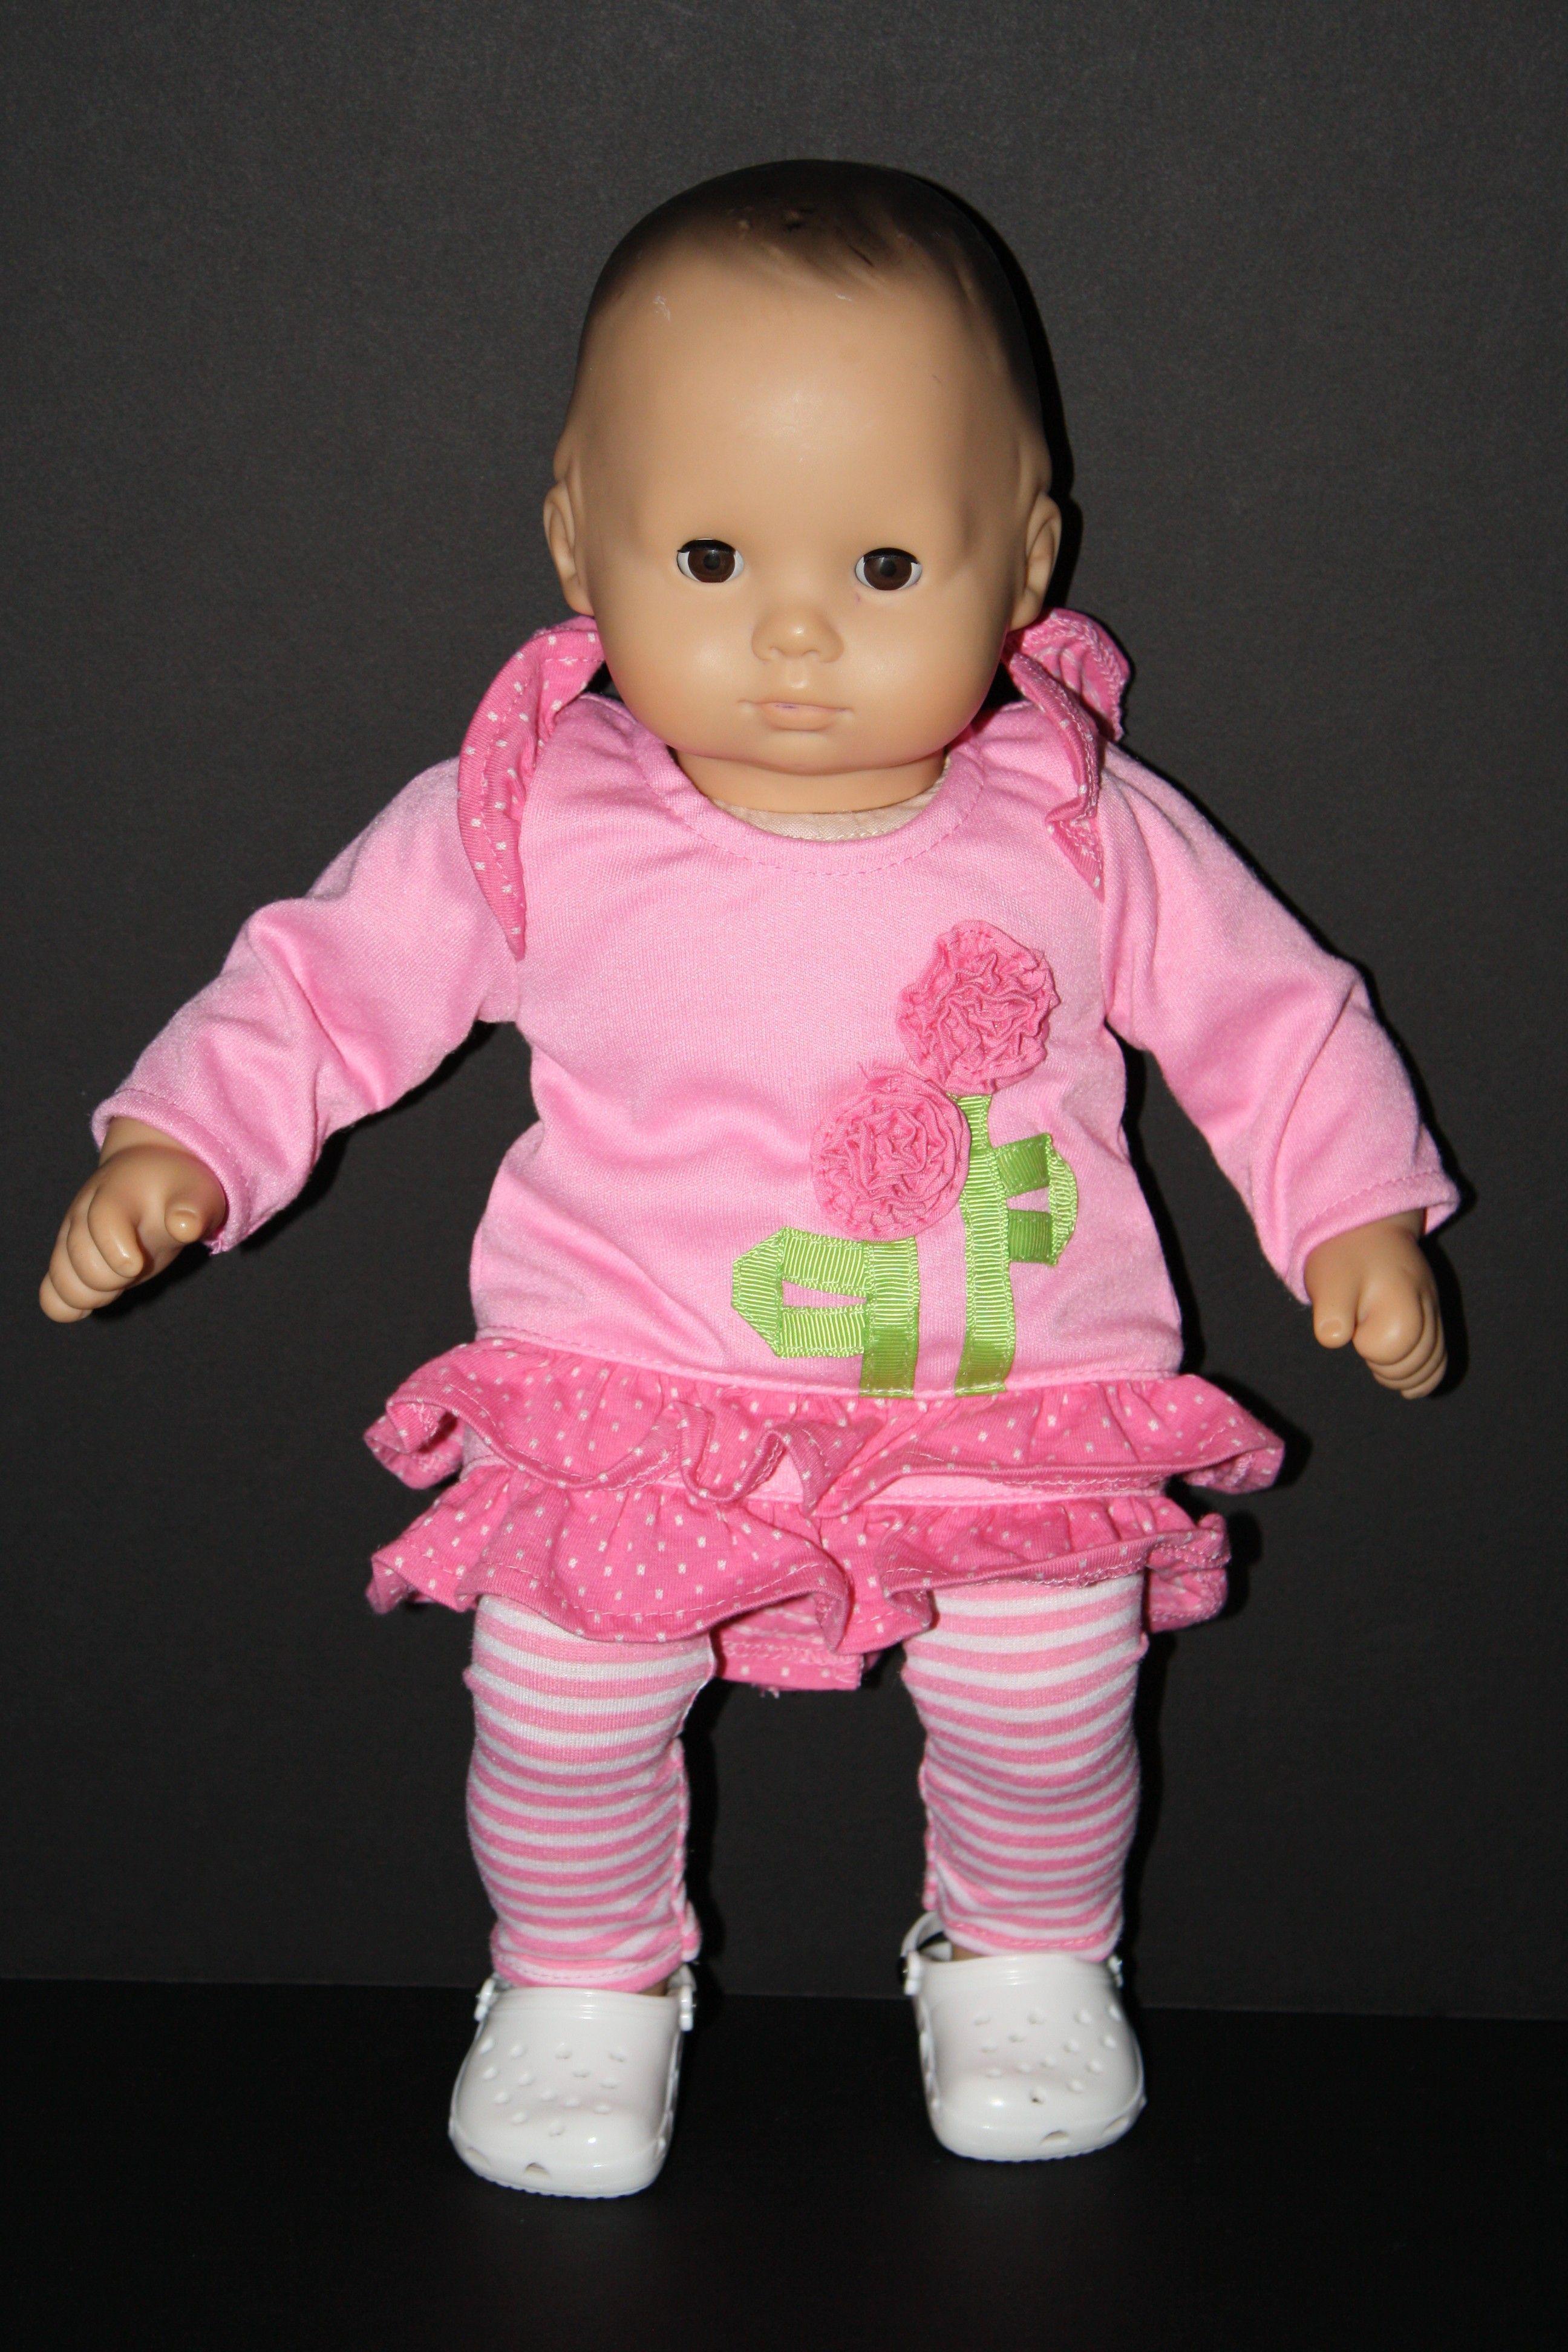 Pink Flower Ruffle Dress and Striped Leggings for American Girl